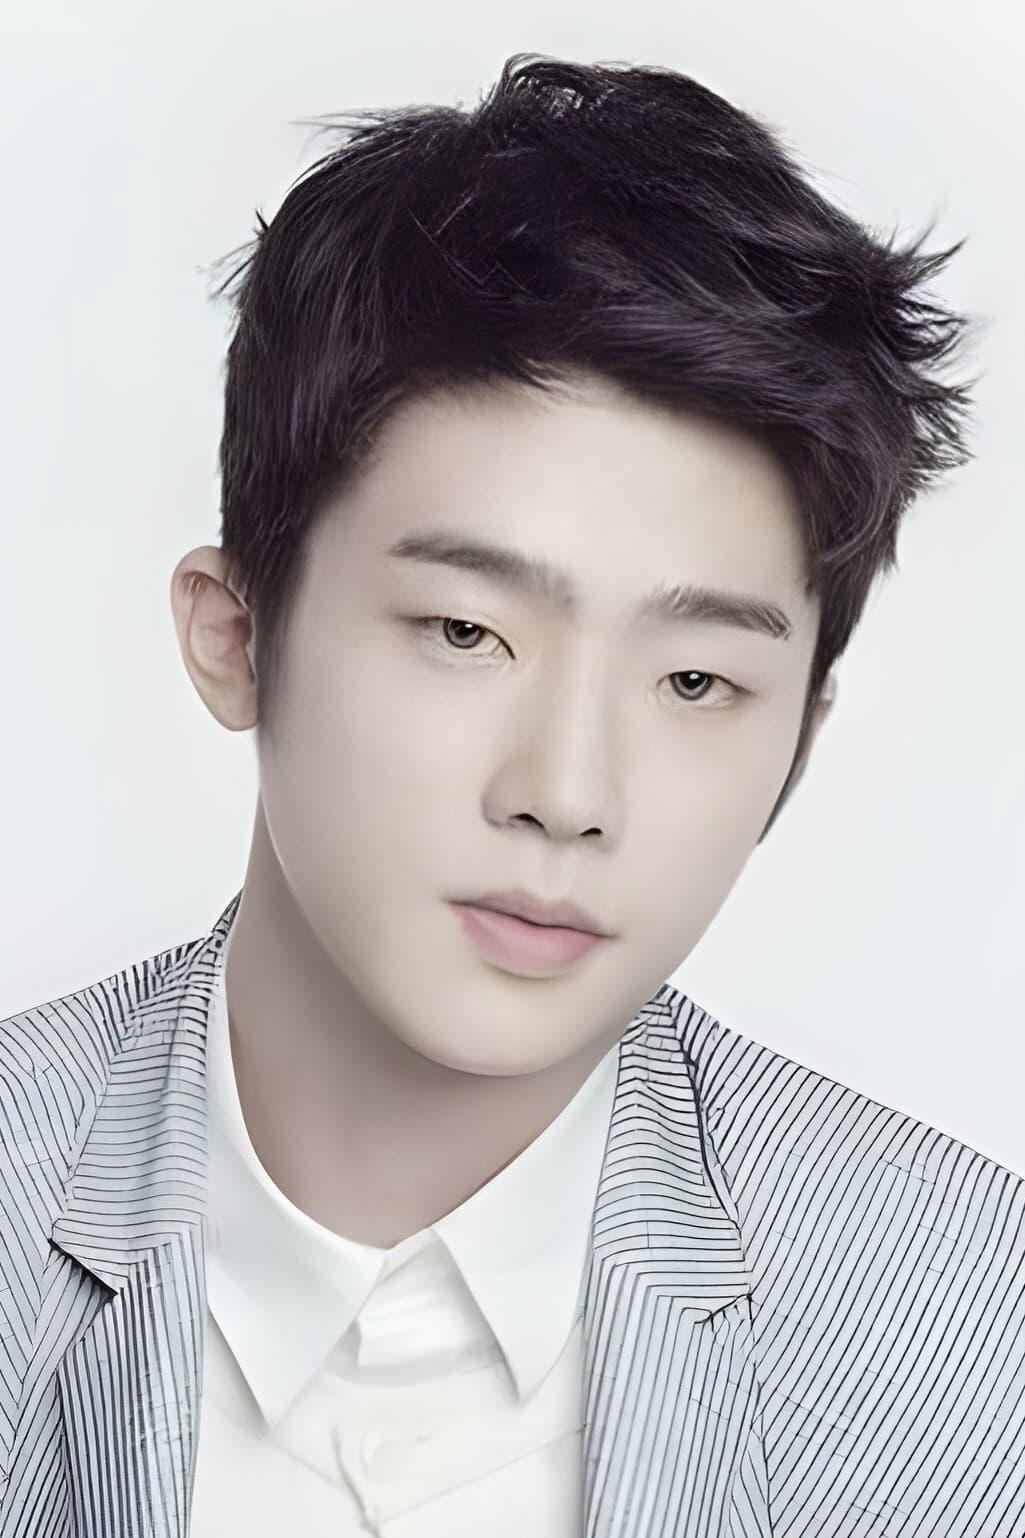 Jang Eui-soo